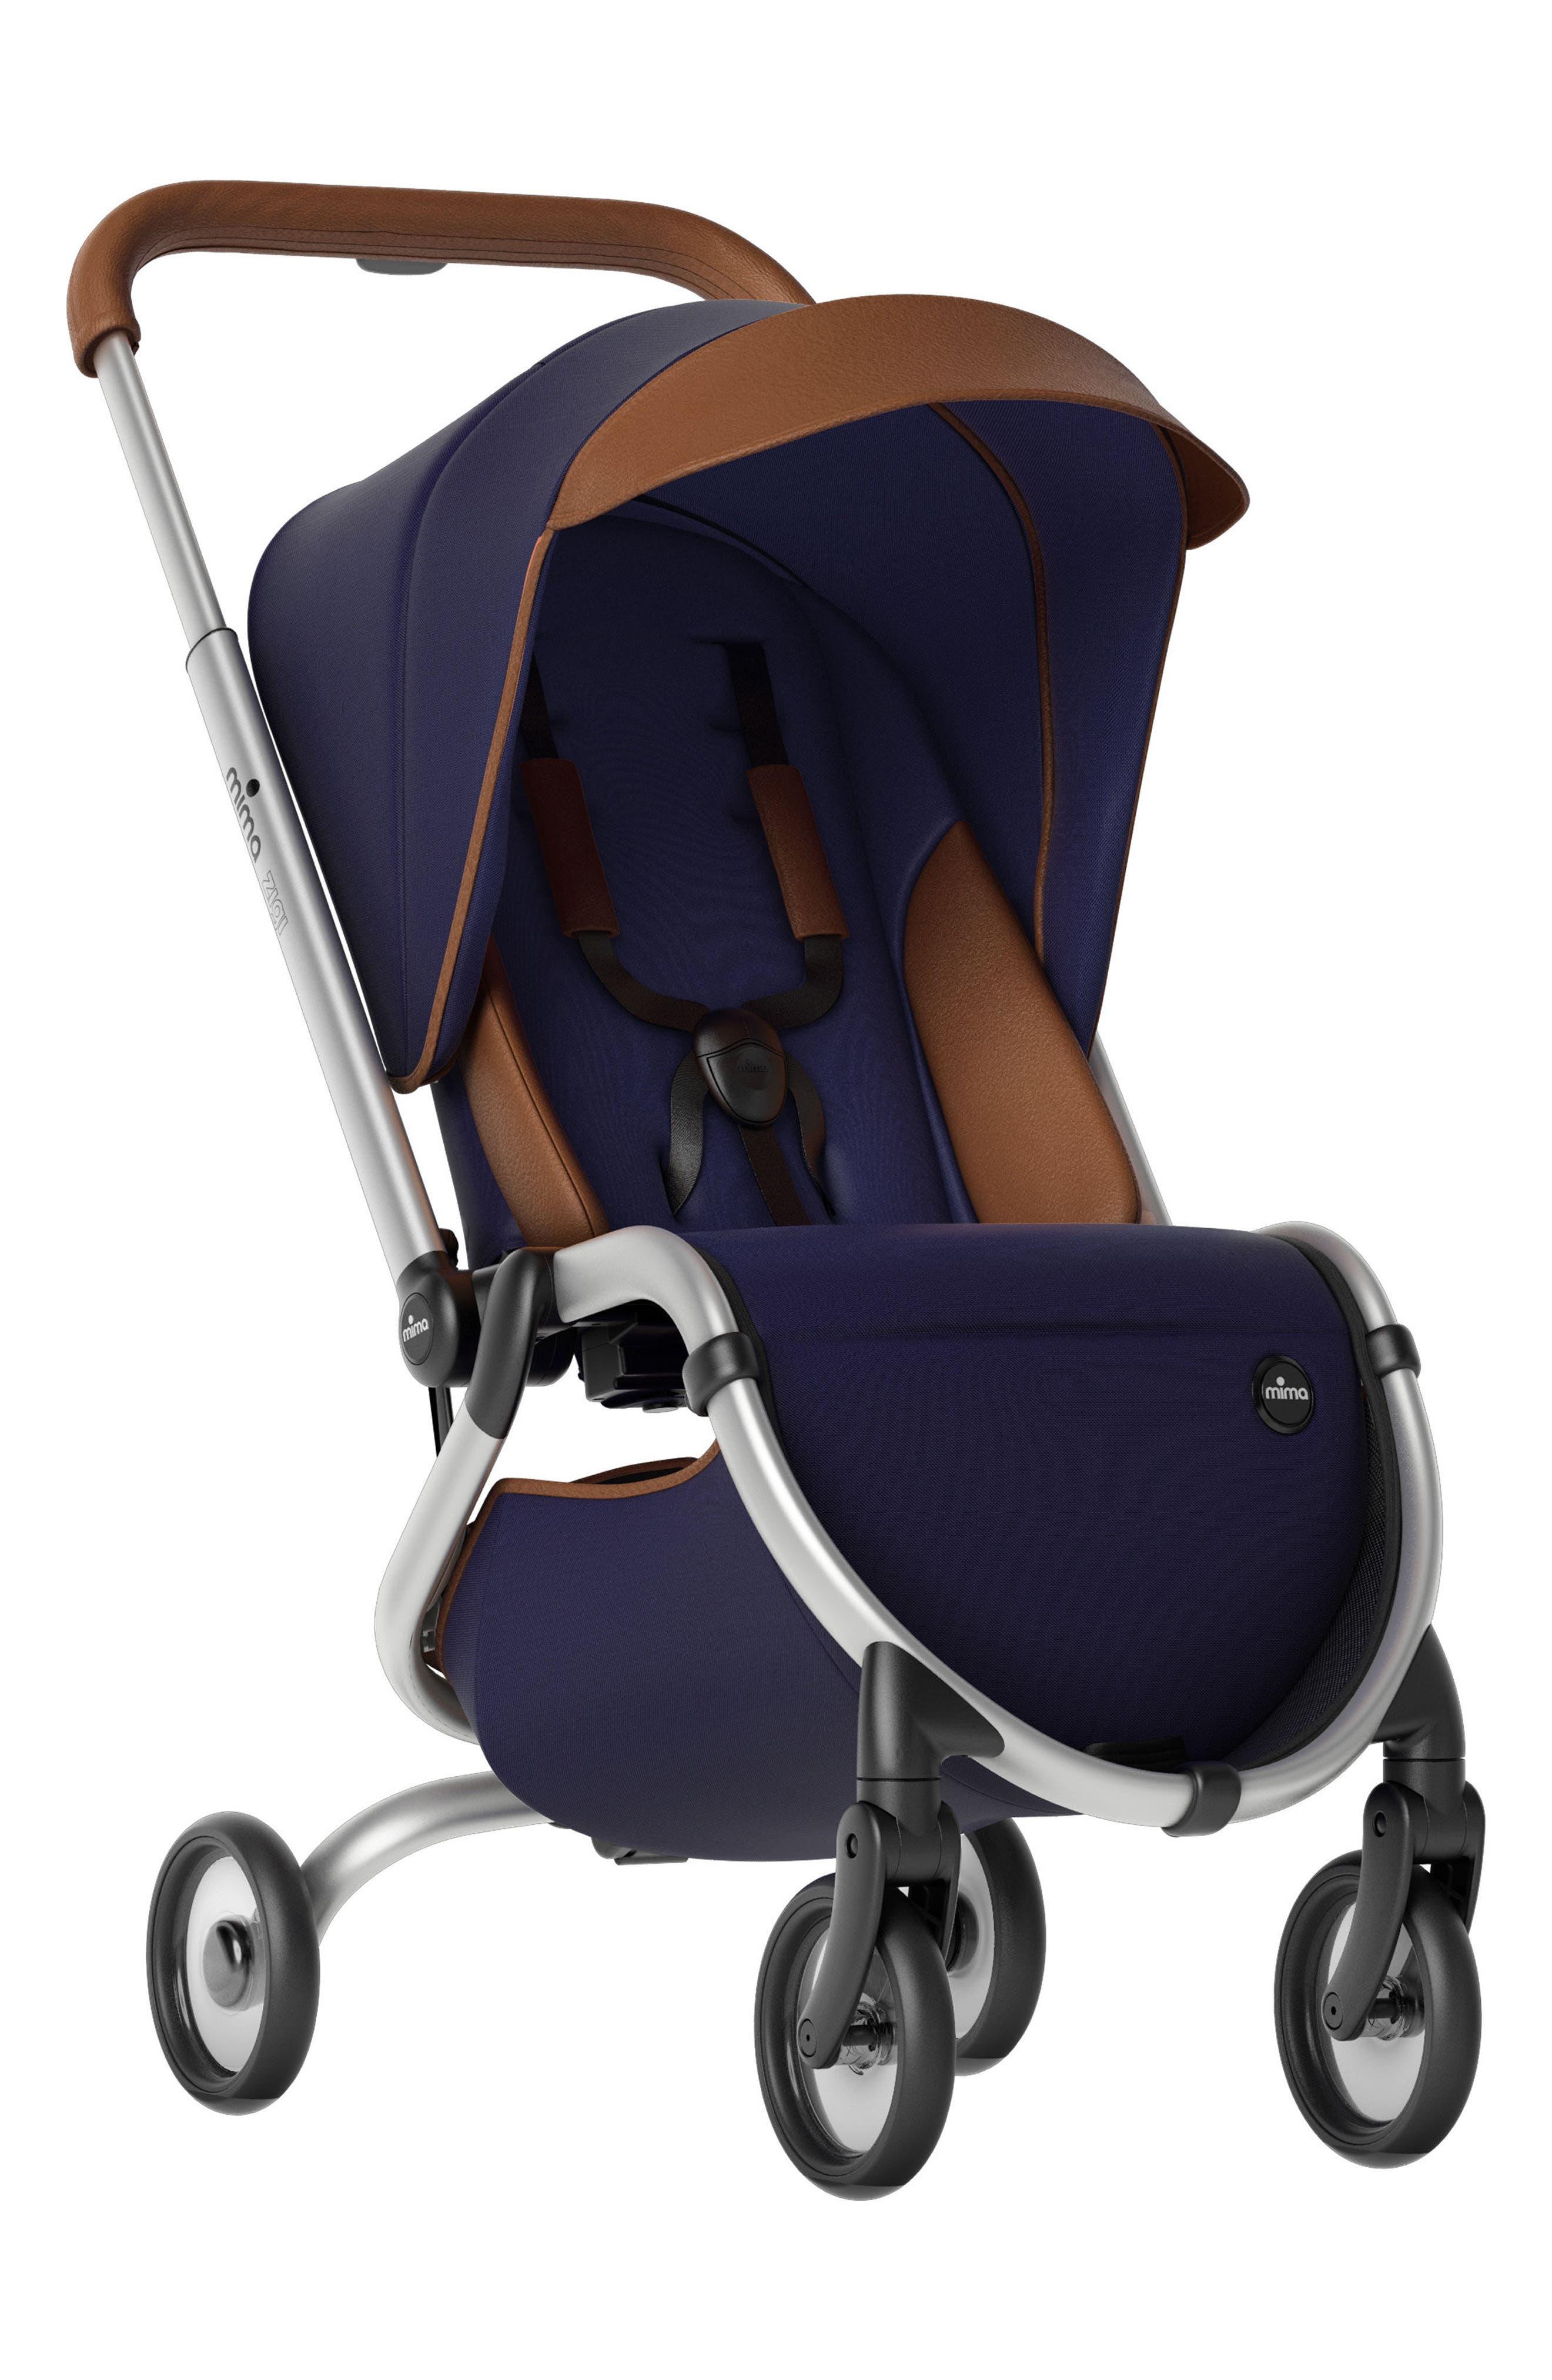 Main Image - Mima Zigi Travel Stroller